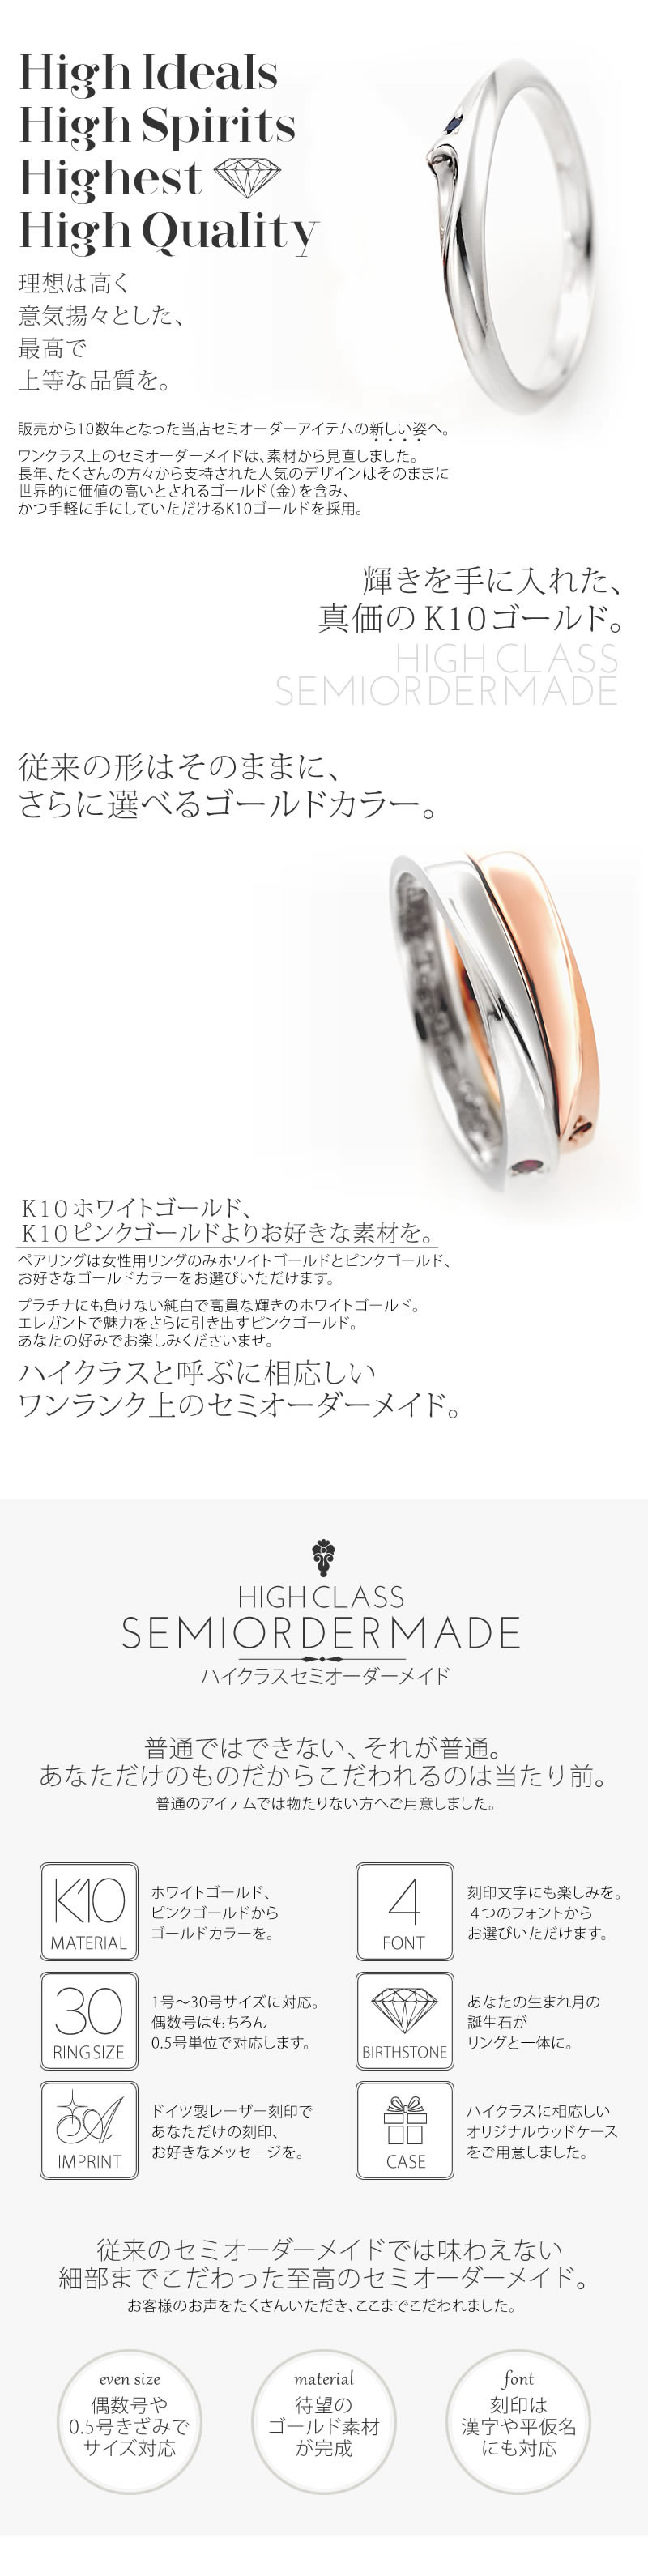 K10 ハイクラスセミオーダーメイド